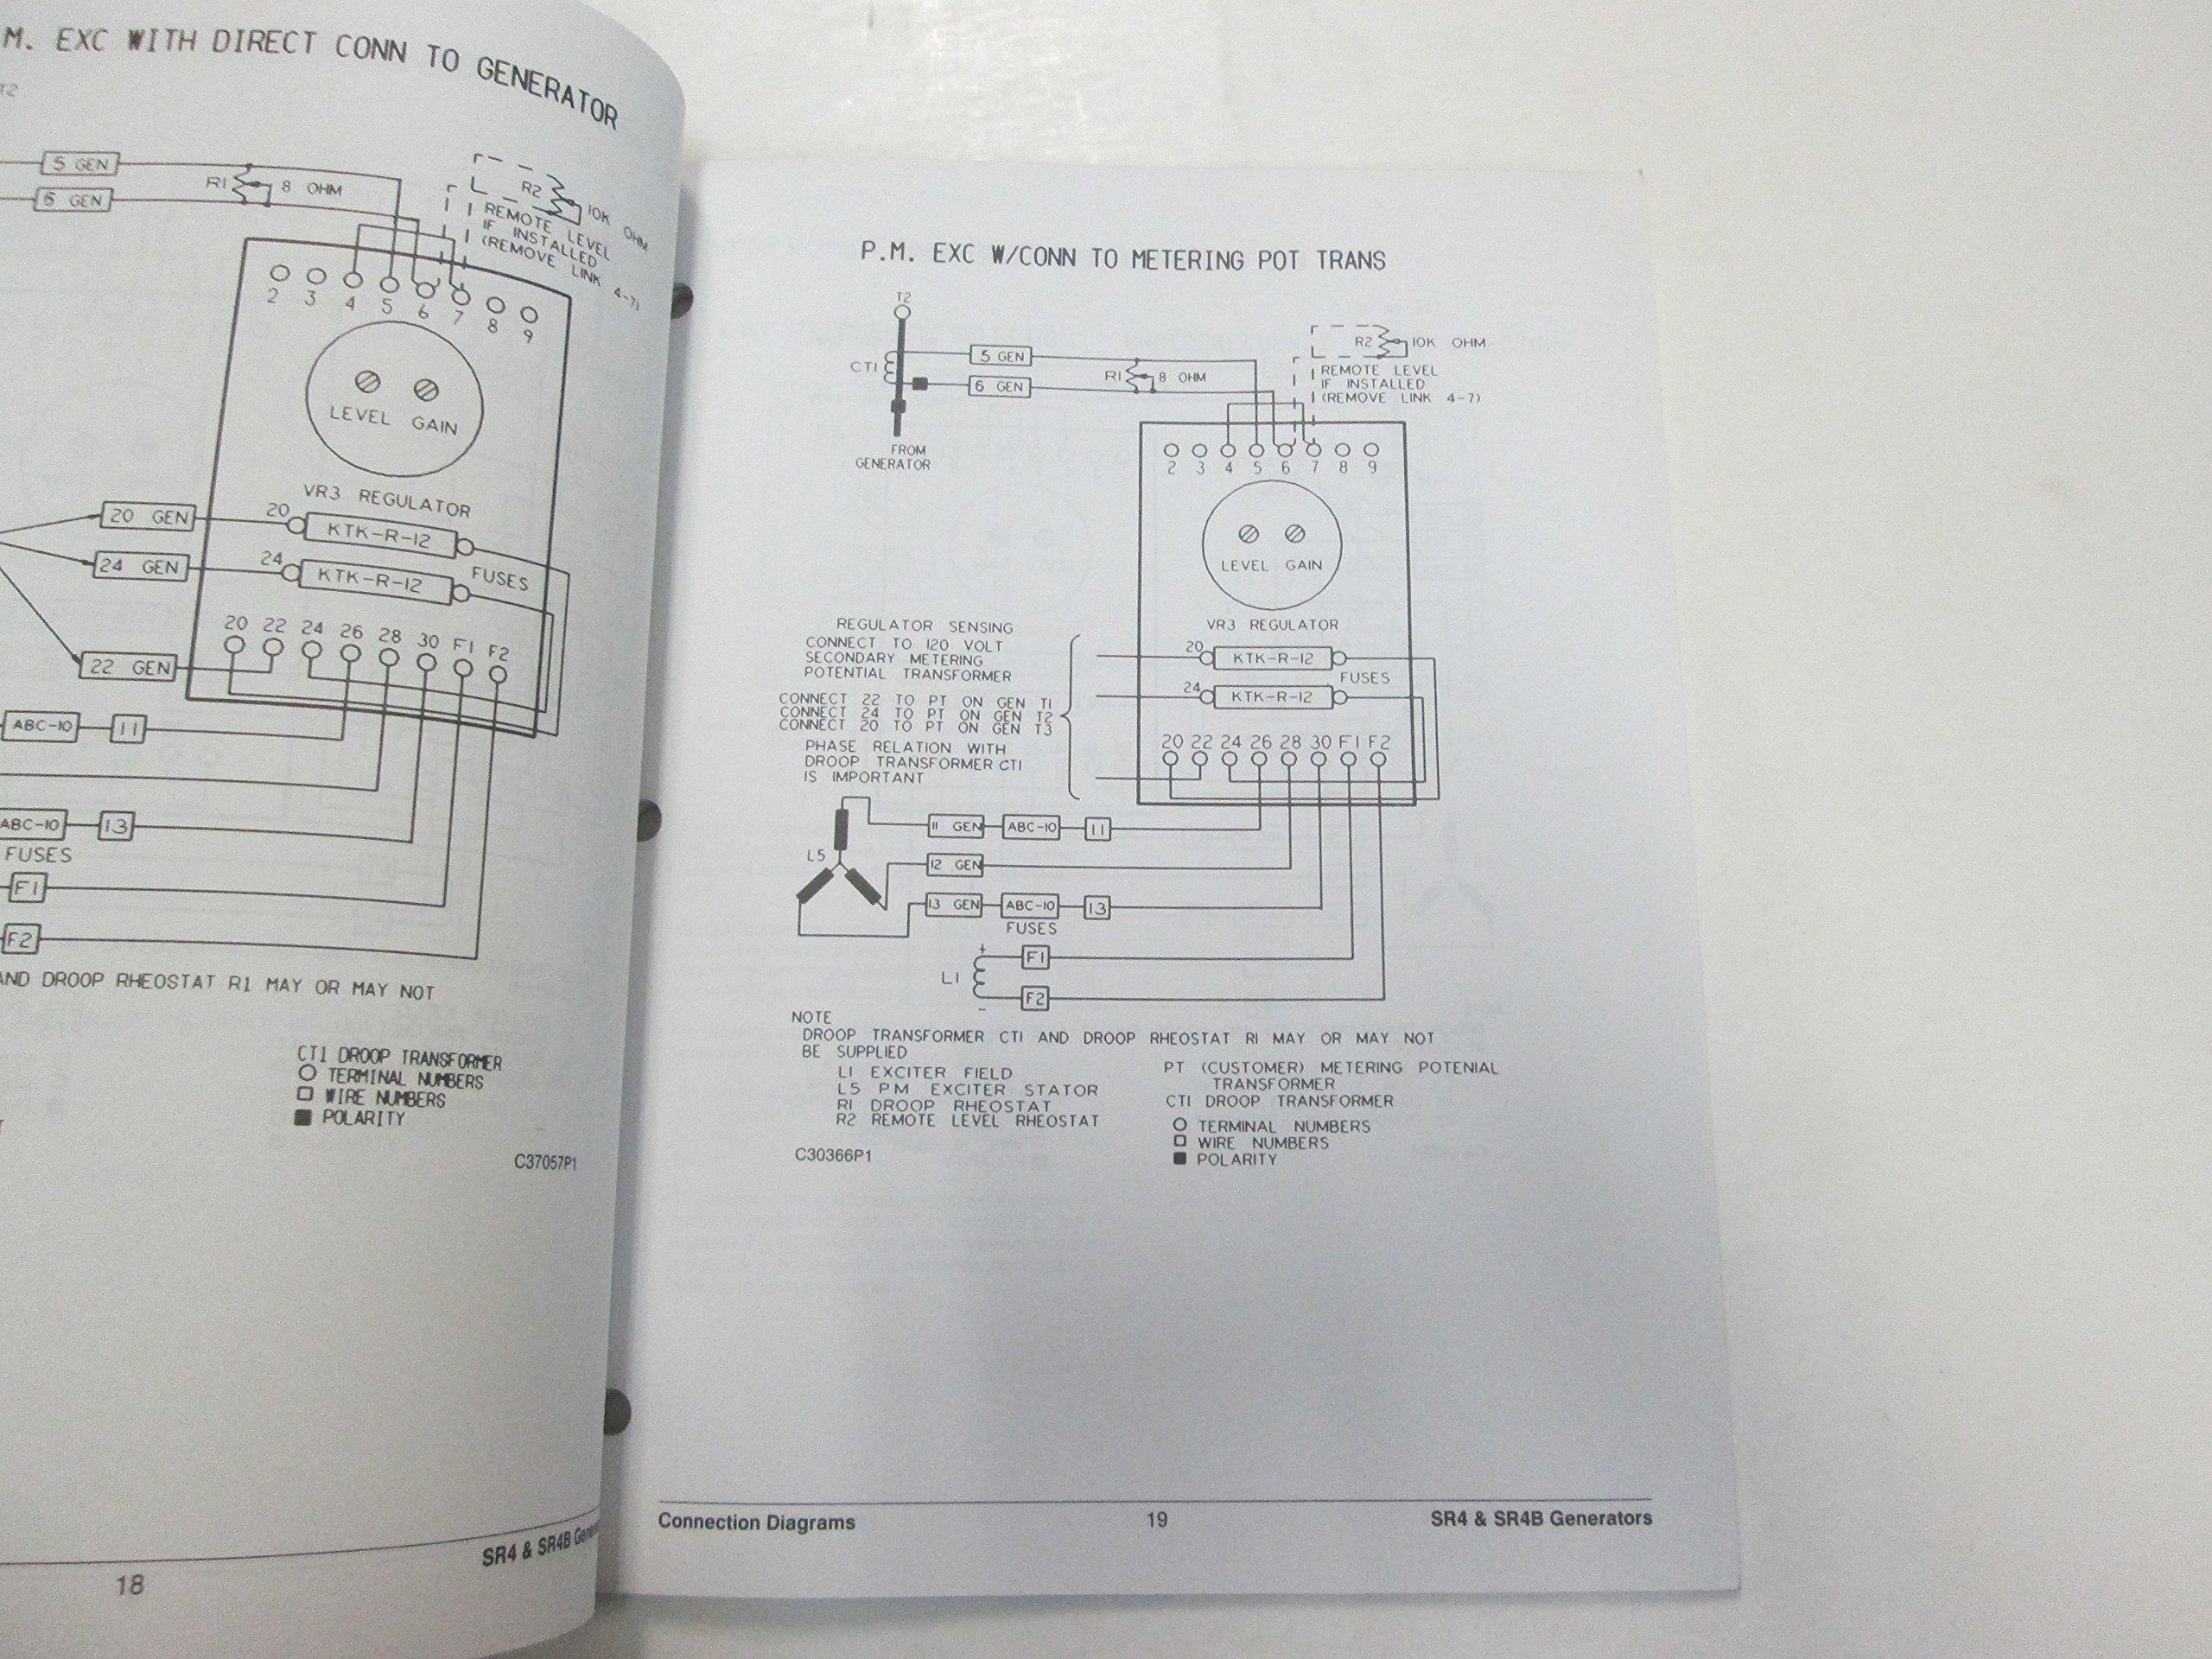 Caterpillar Connection Diagrams SR4 SR4B Generators Voltage Schematic Manual  OEM: Caterpillar: Amazon.com: BooksAmazon.com